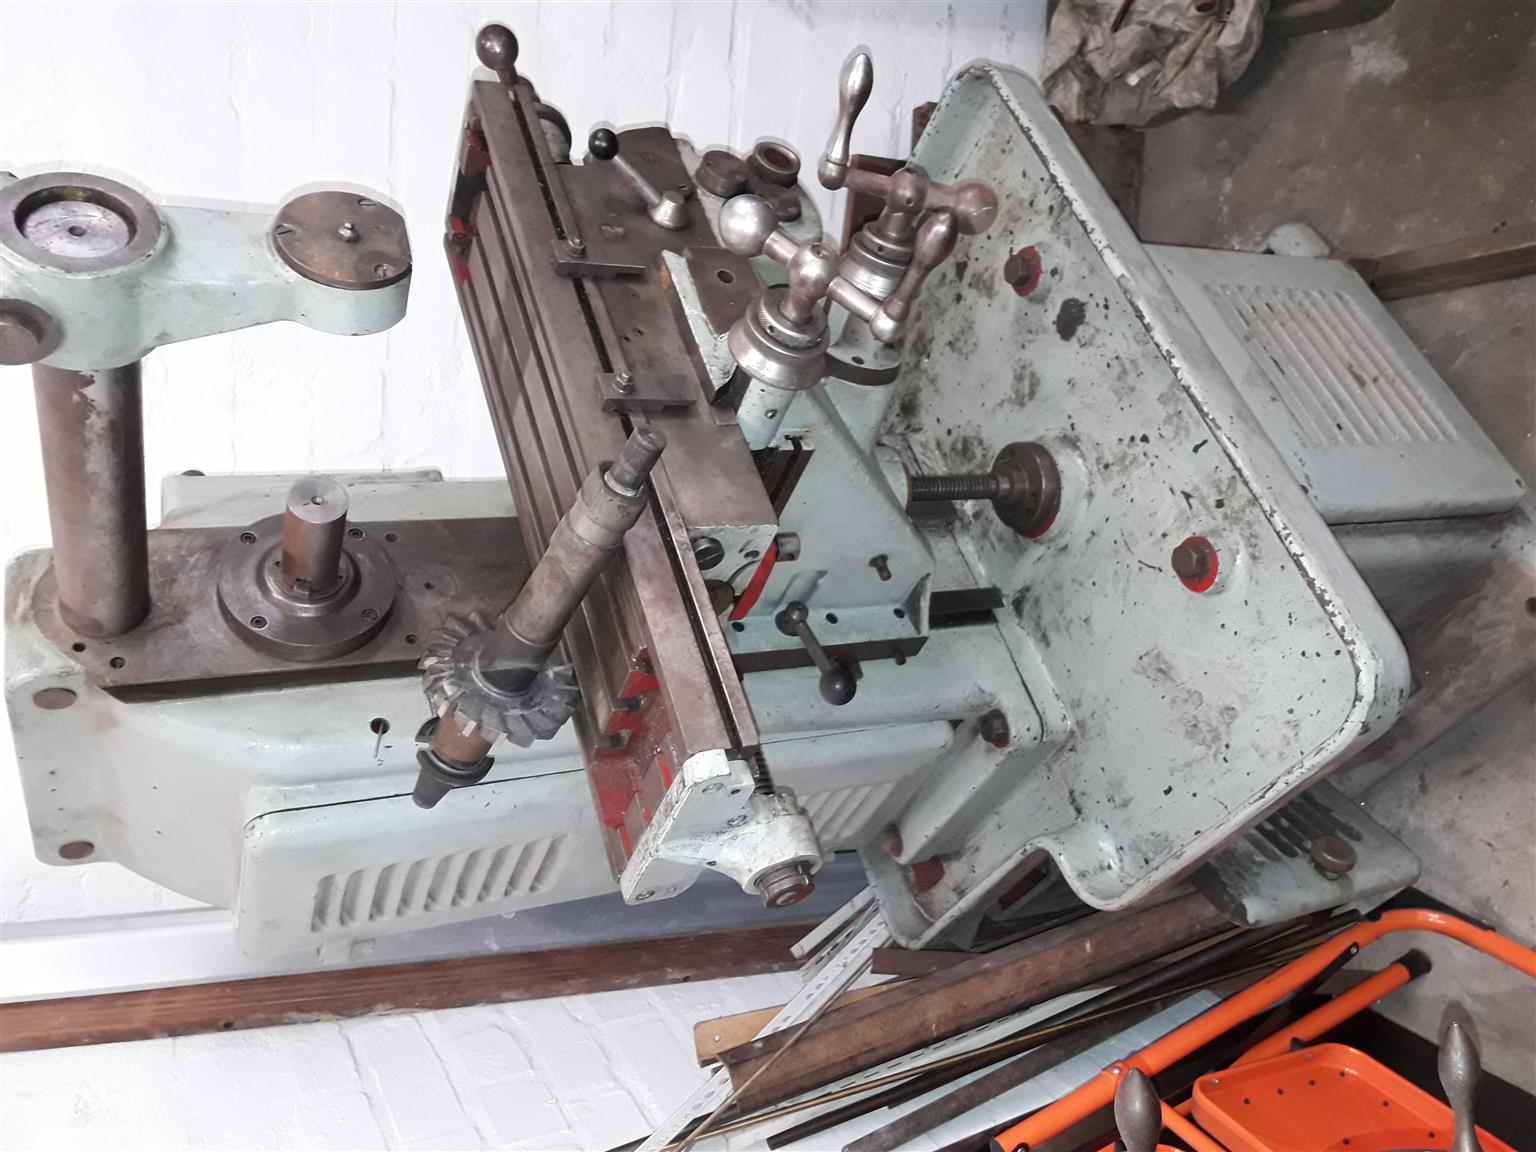 Adcock&Shipley Horizontal Milling Machine